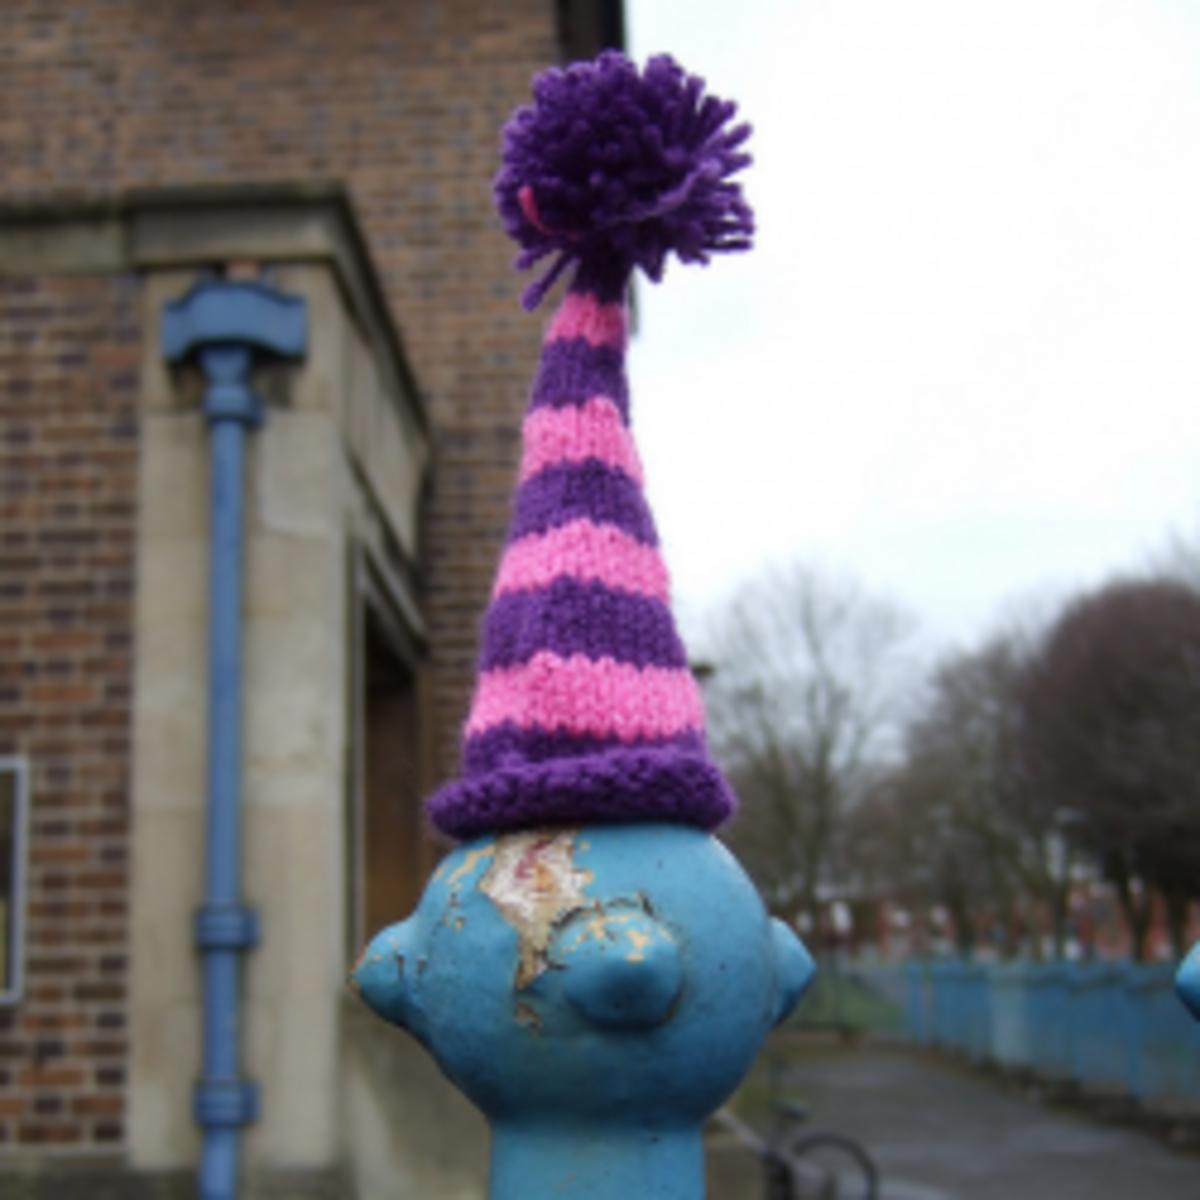 guerilla-art-crafts-gallery-cool-street-artwork-and-installations